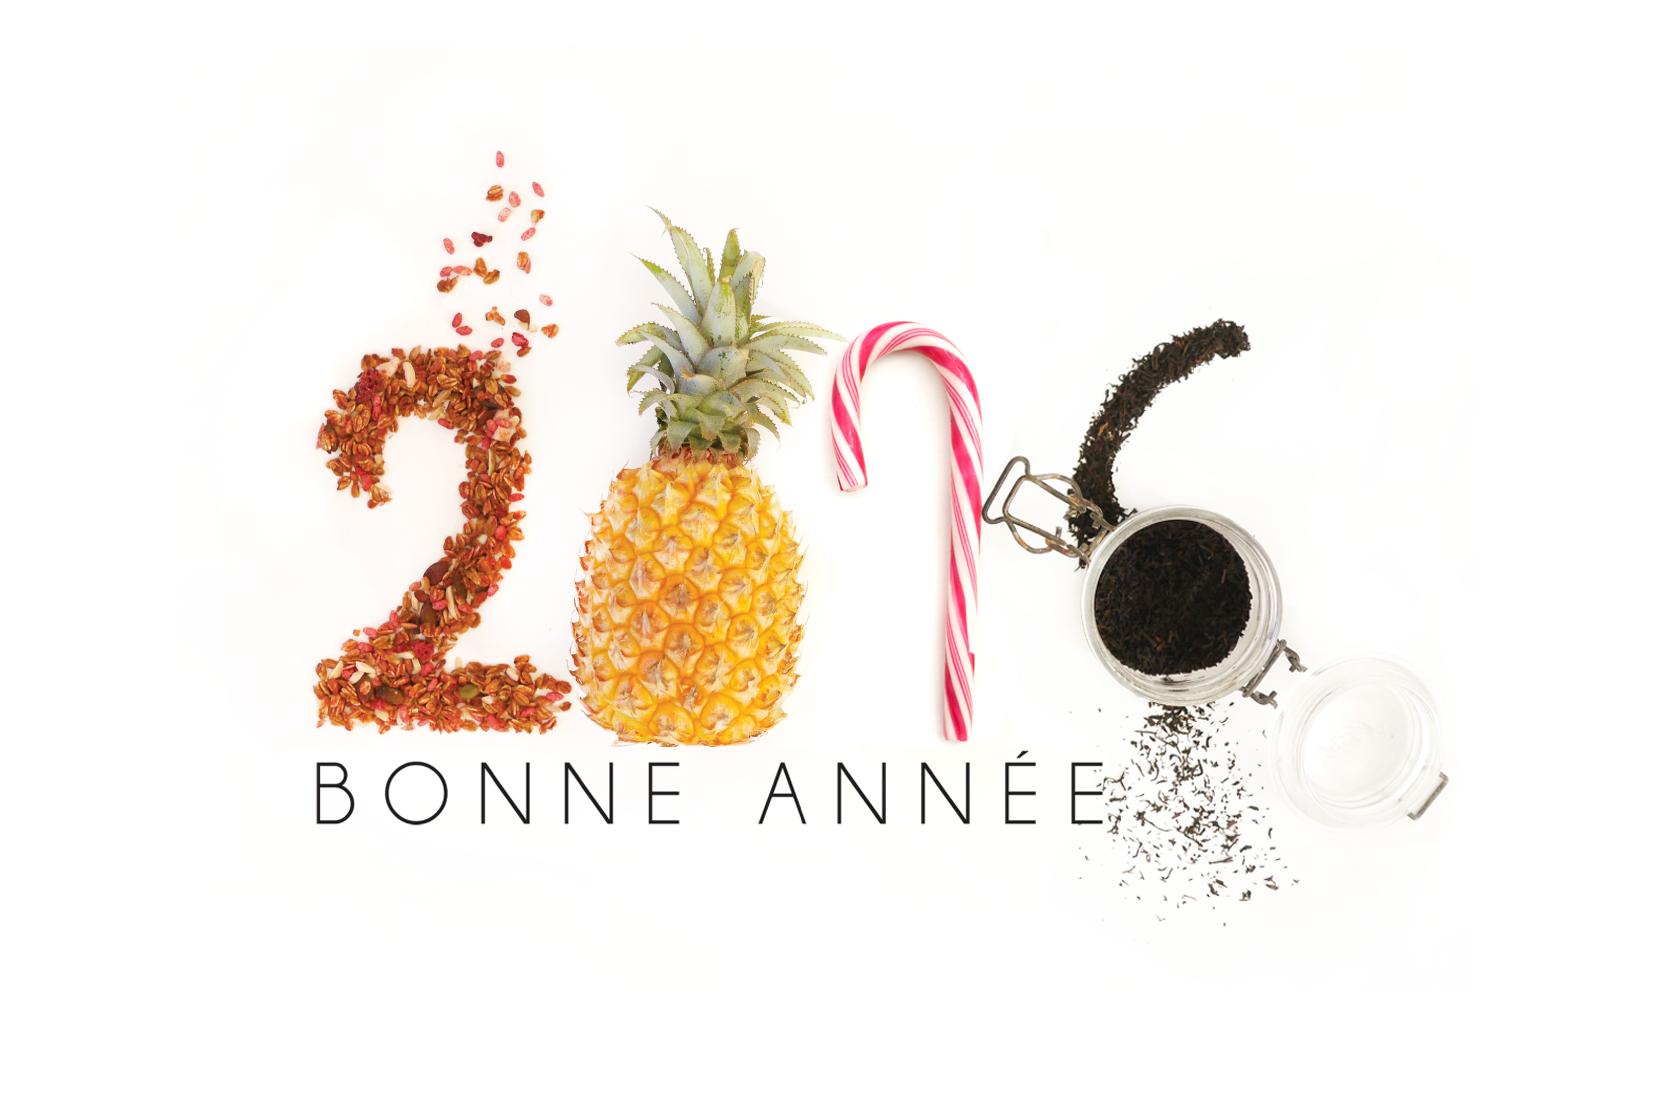 CARTE BONNE ANNÉE-ACCUEIL